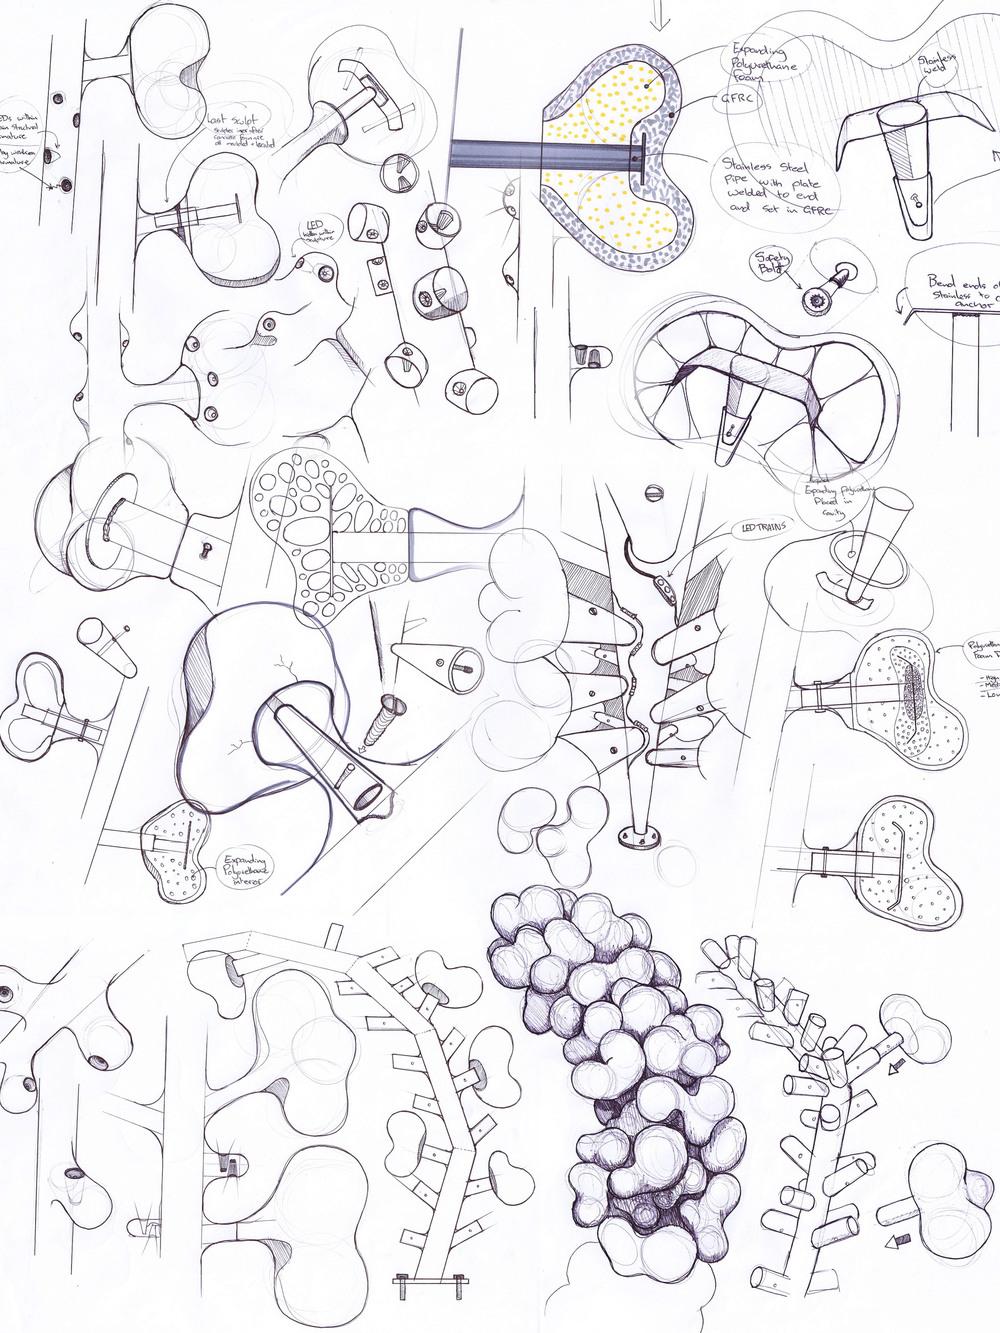 Final sketchwork 2.jpg